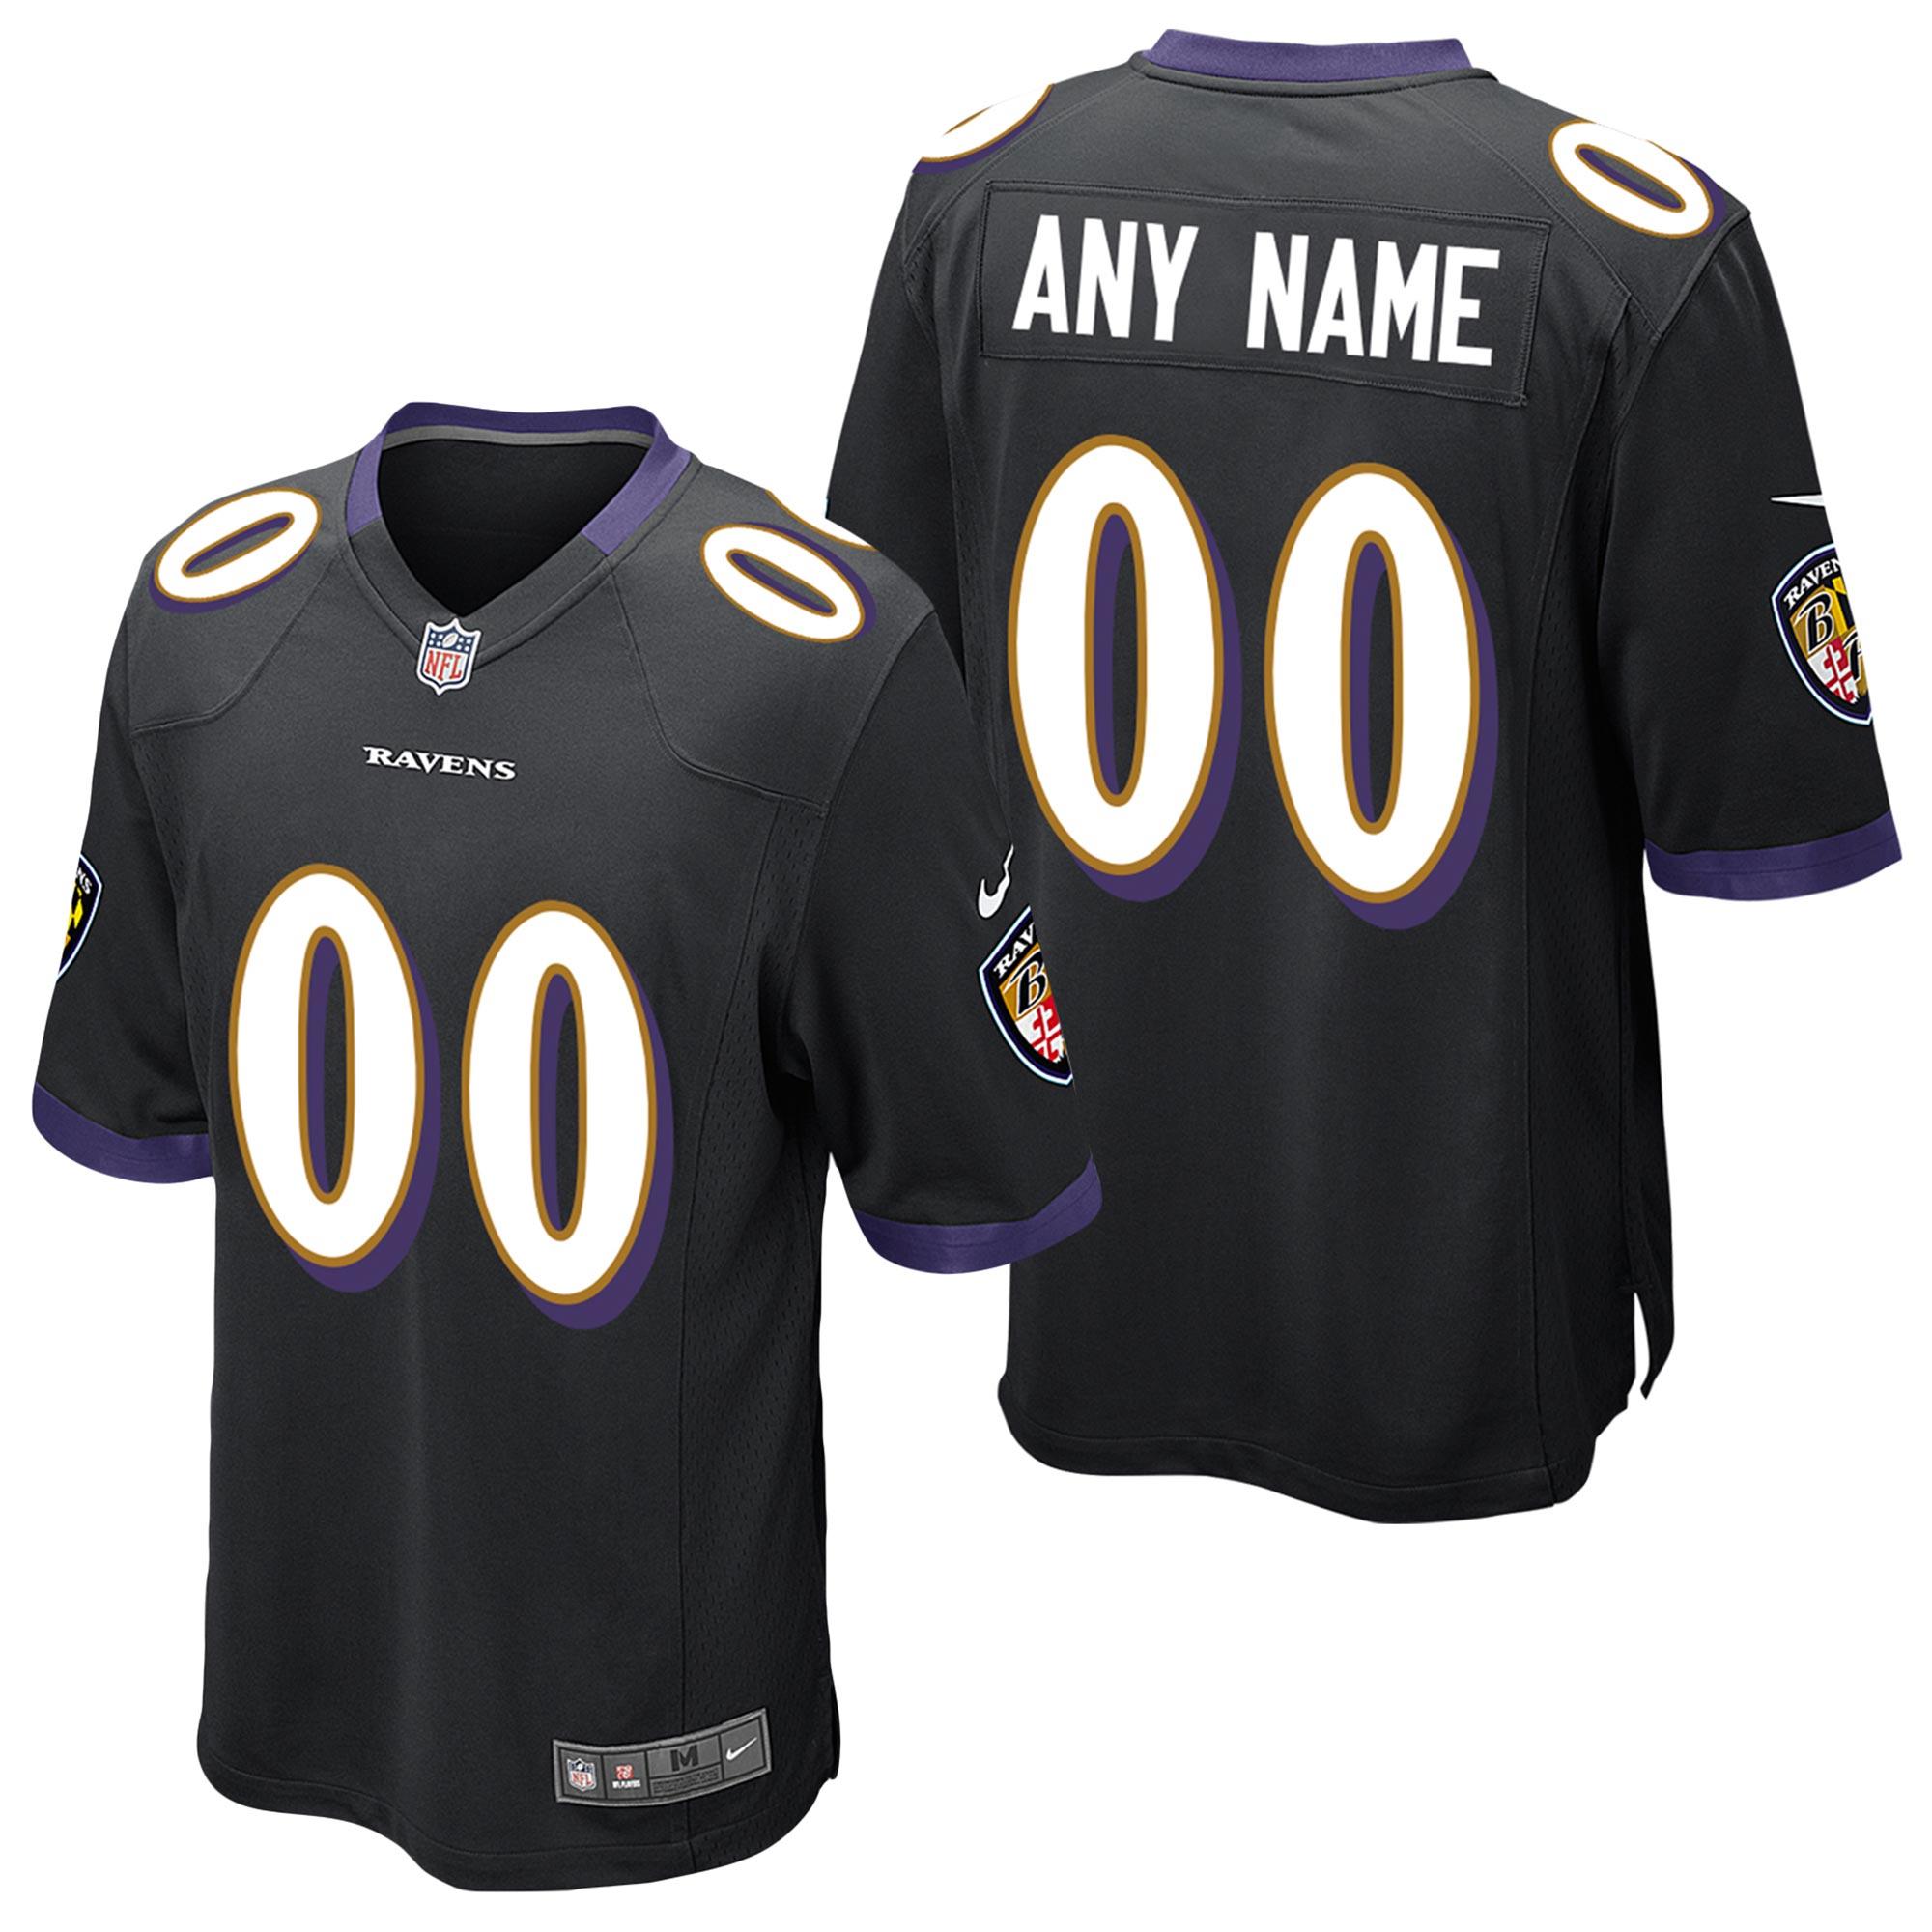 Baltimore Ravens Ausweichtrikot - maßgeschneidert - Jugendliche